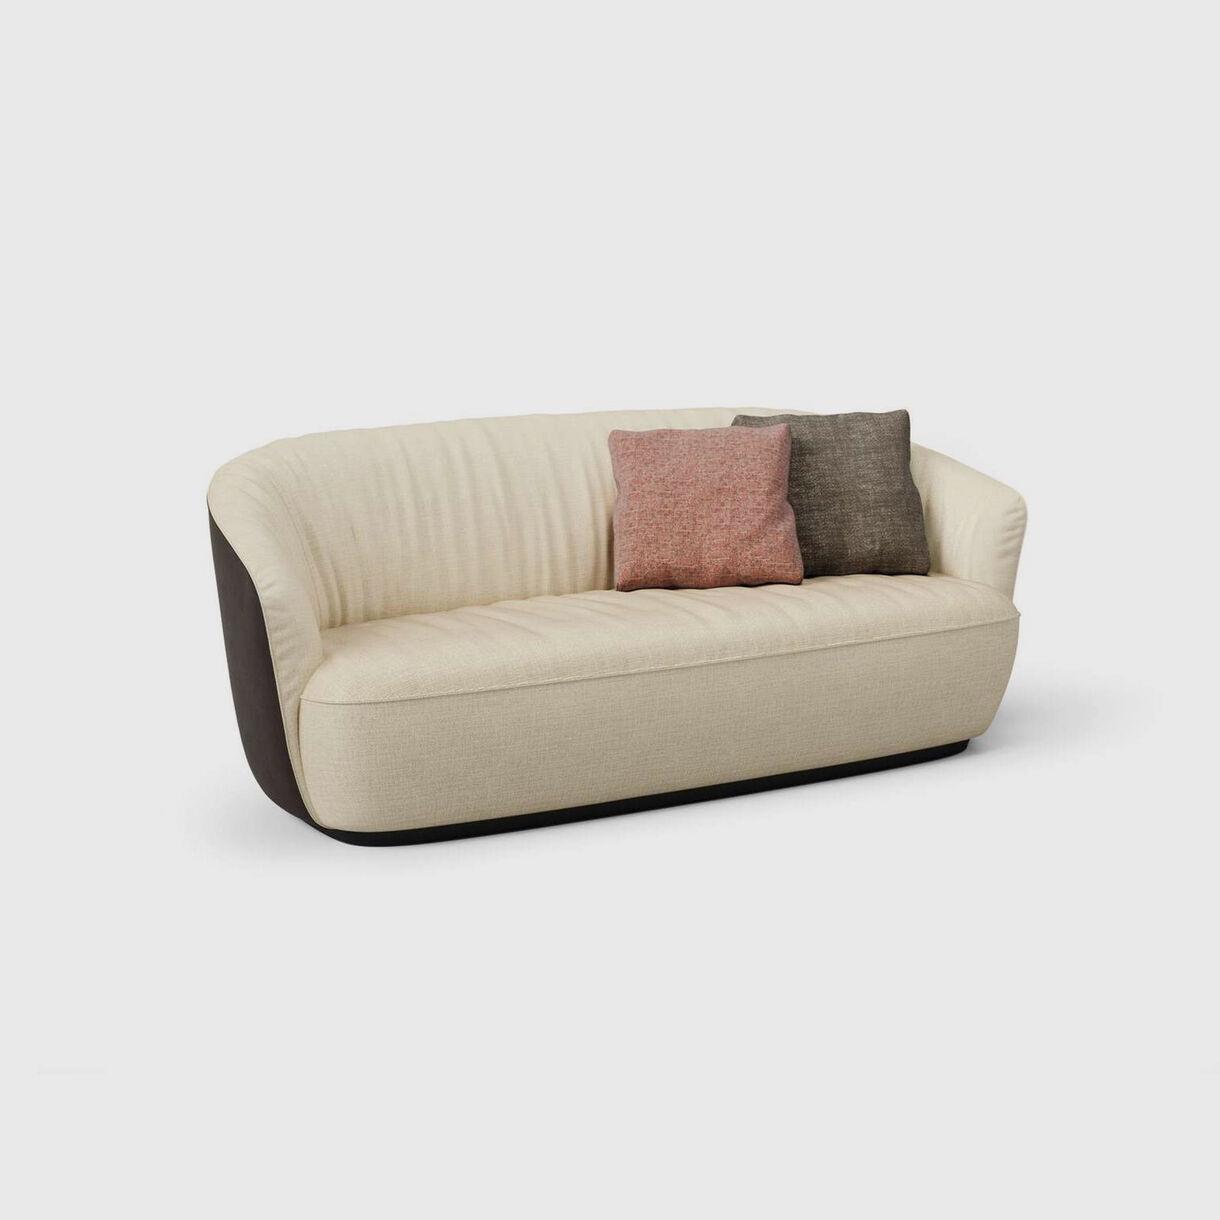 Ishino Sofa, 2.5 Seater